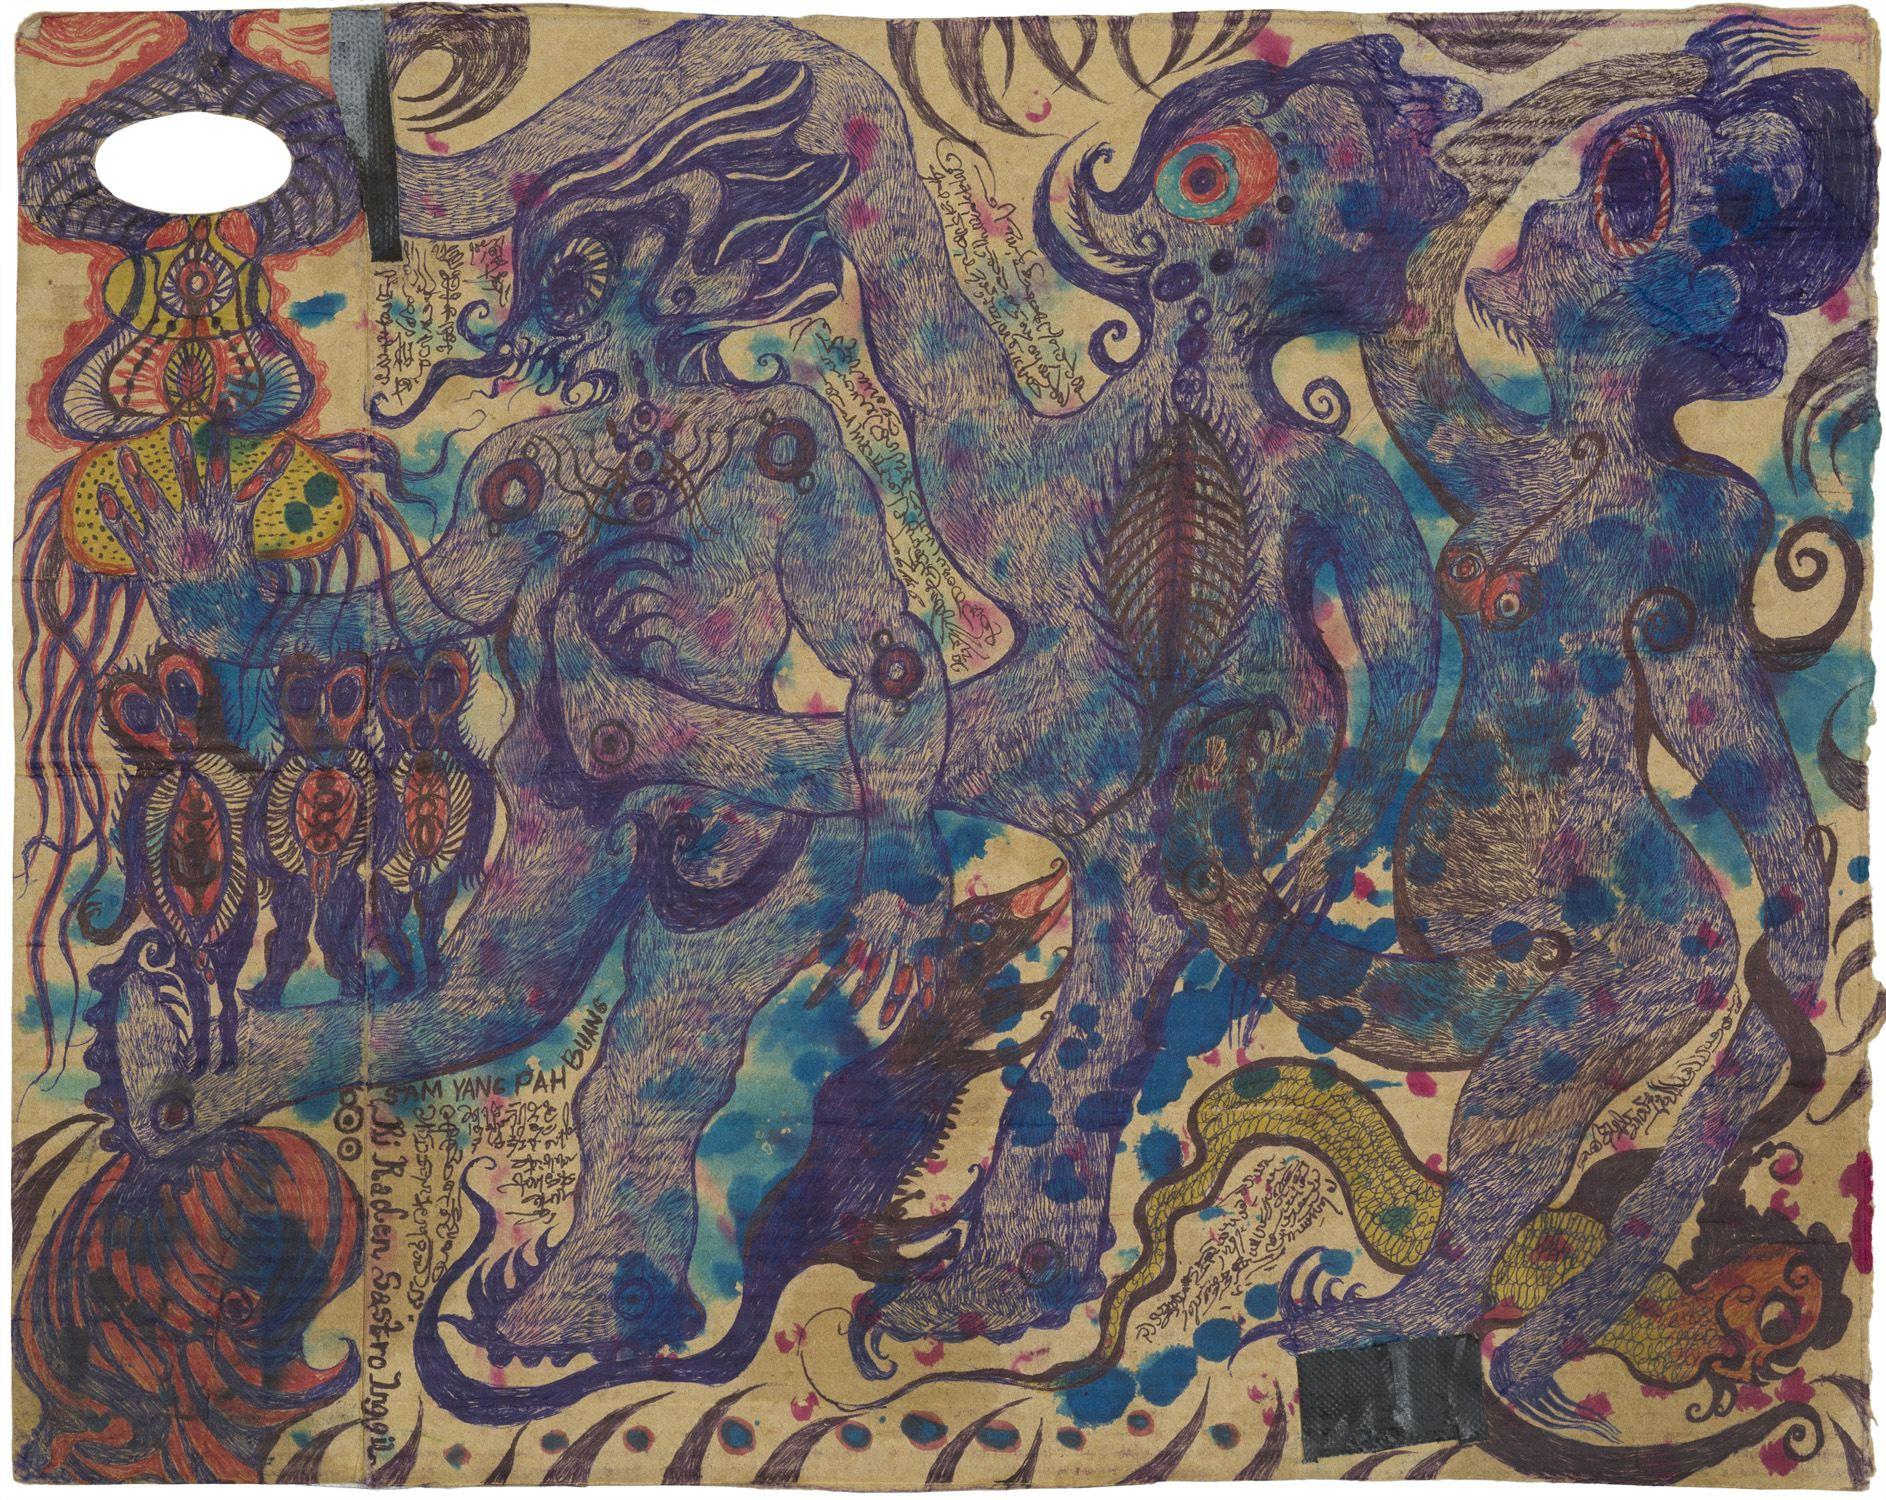 Noviadi Angkasapura    Untitled  , 2014 Ink and watercolor on cardboard 11.5 x 13.5 inches 29.2 x 34.3 cm NoA 135